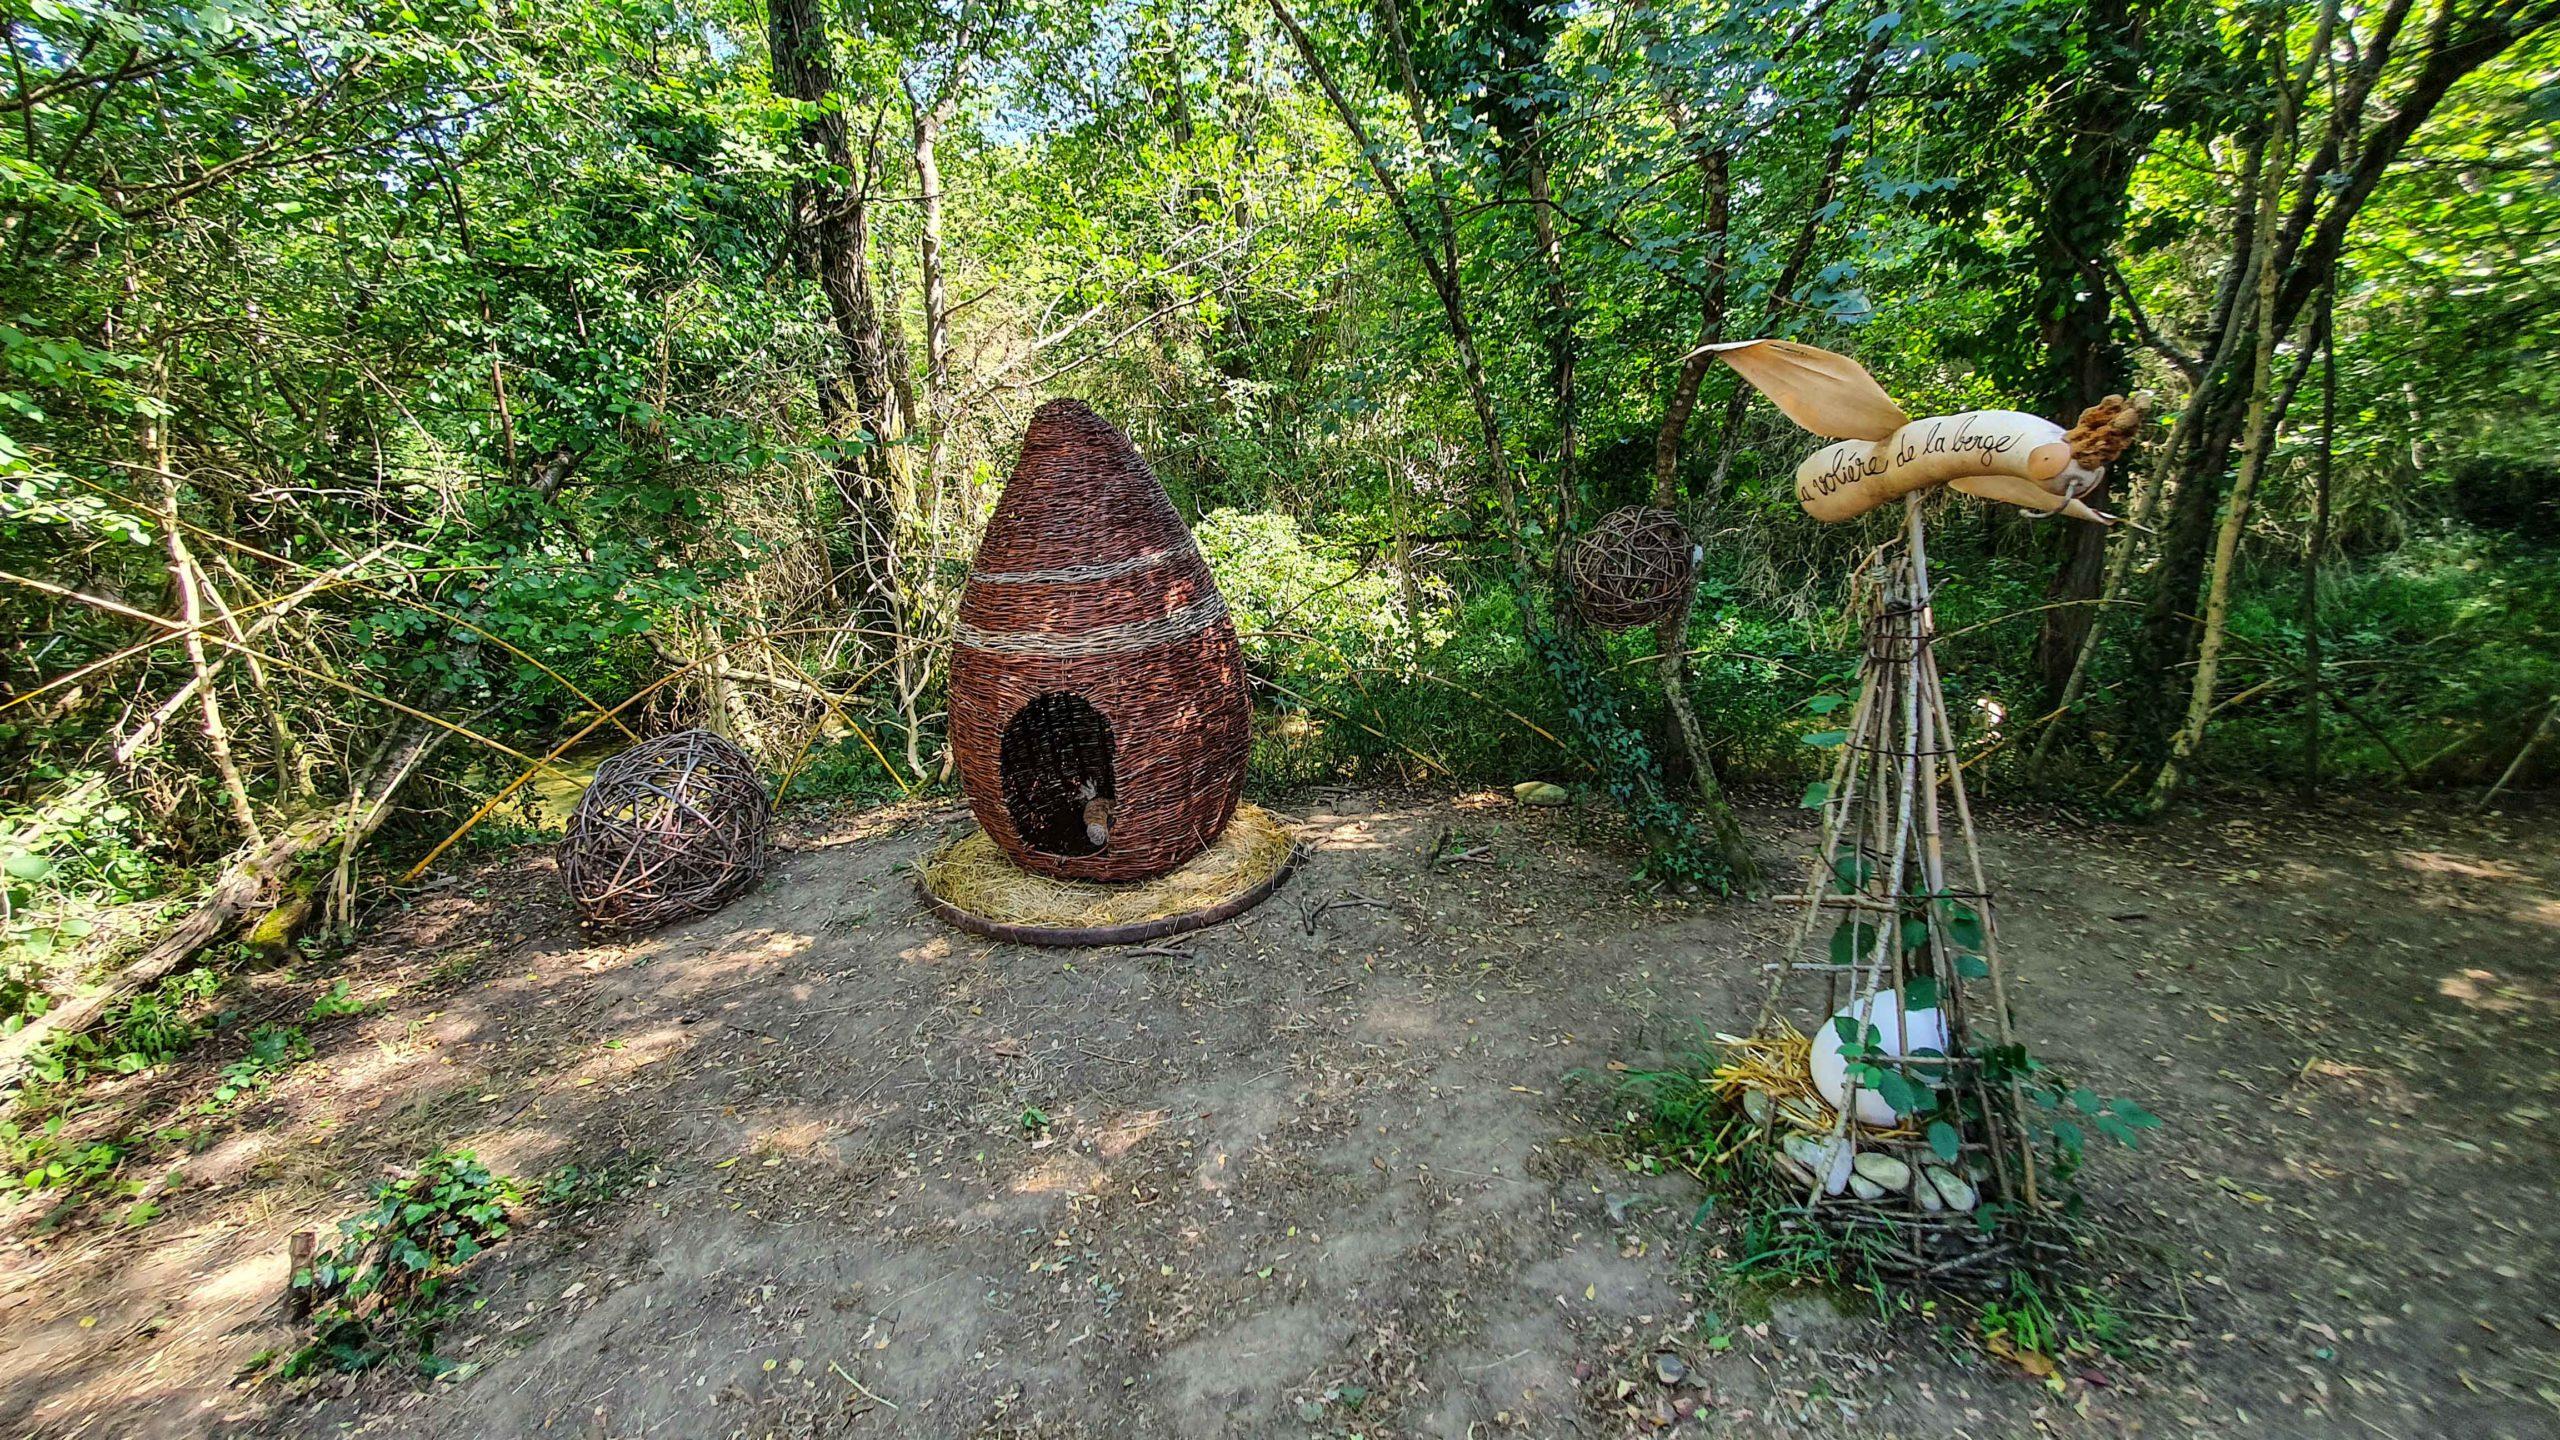 Le Jardin extraordinaire - Lieurac